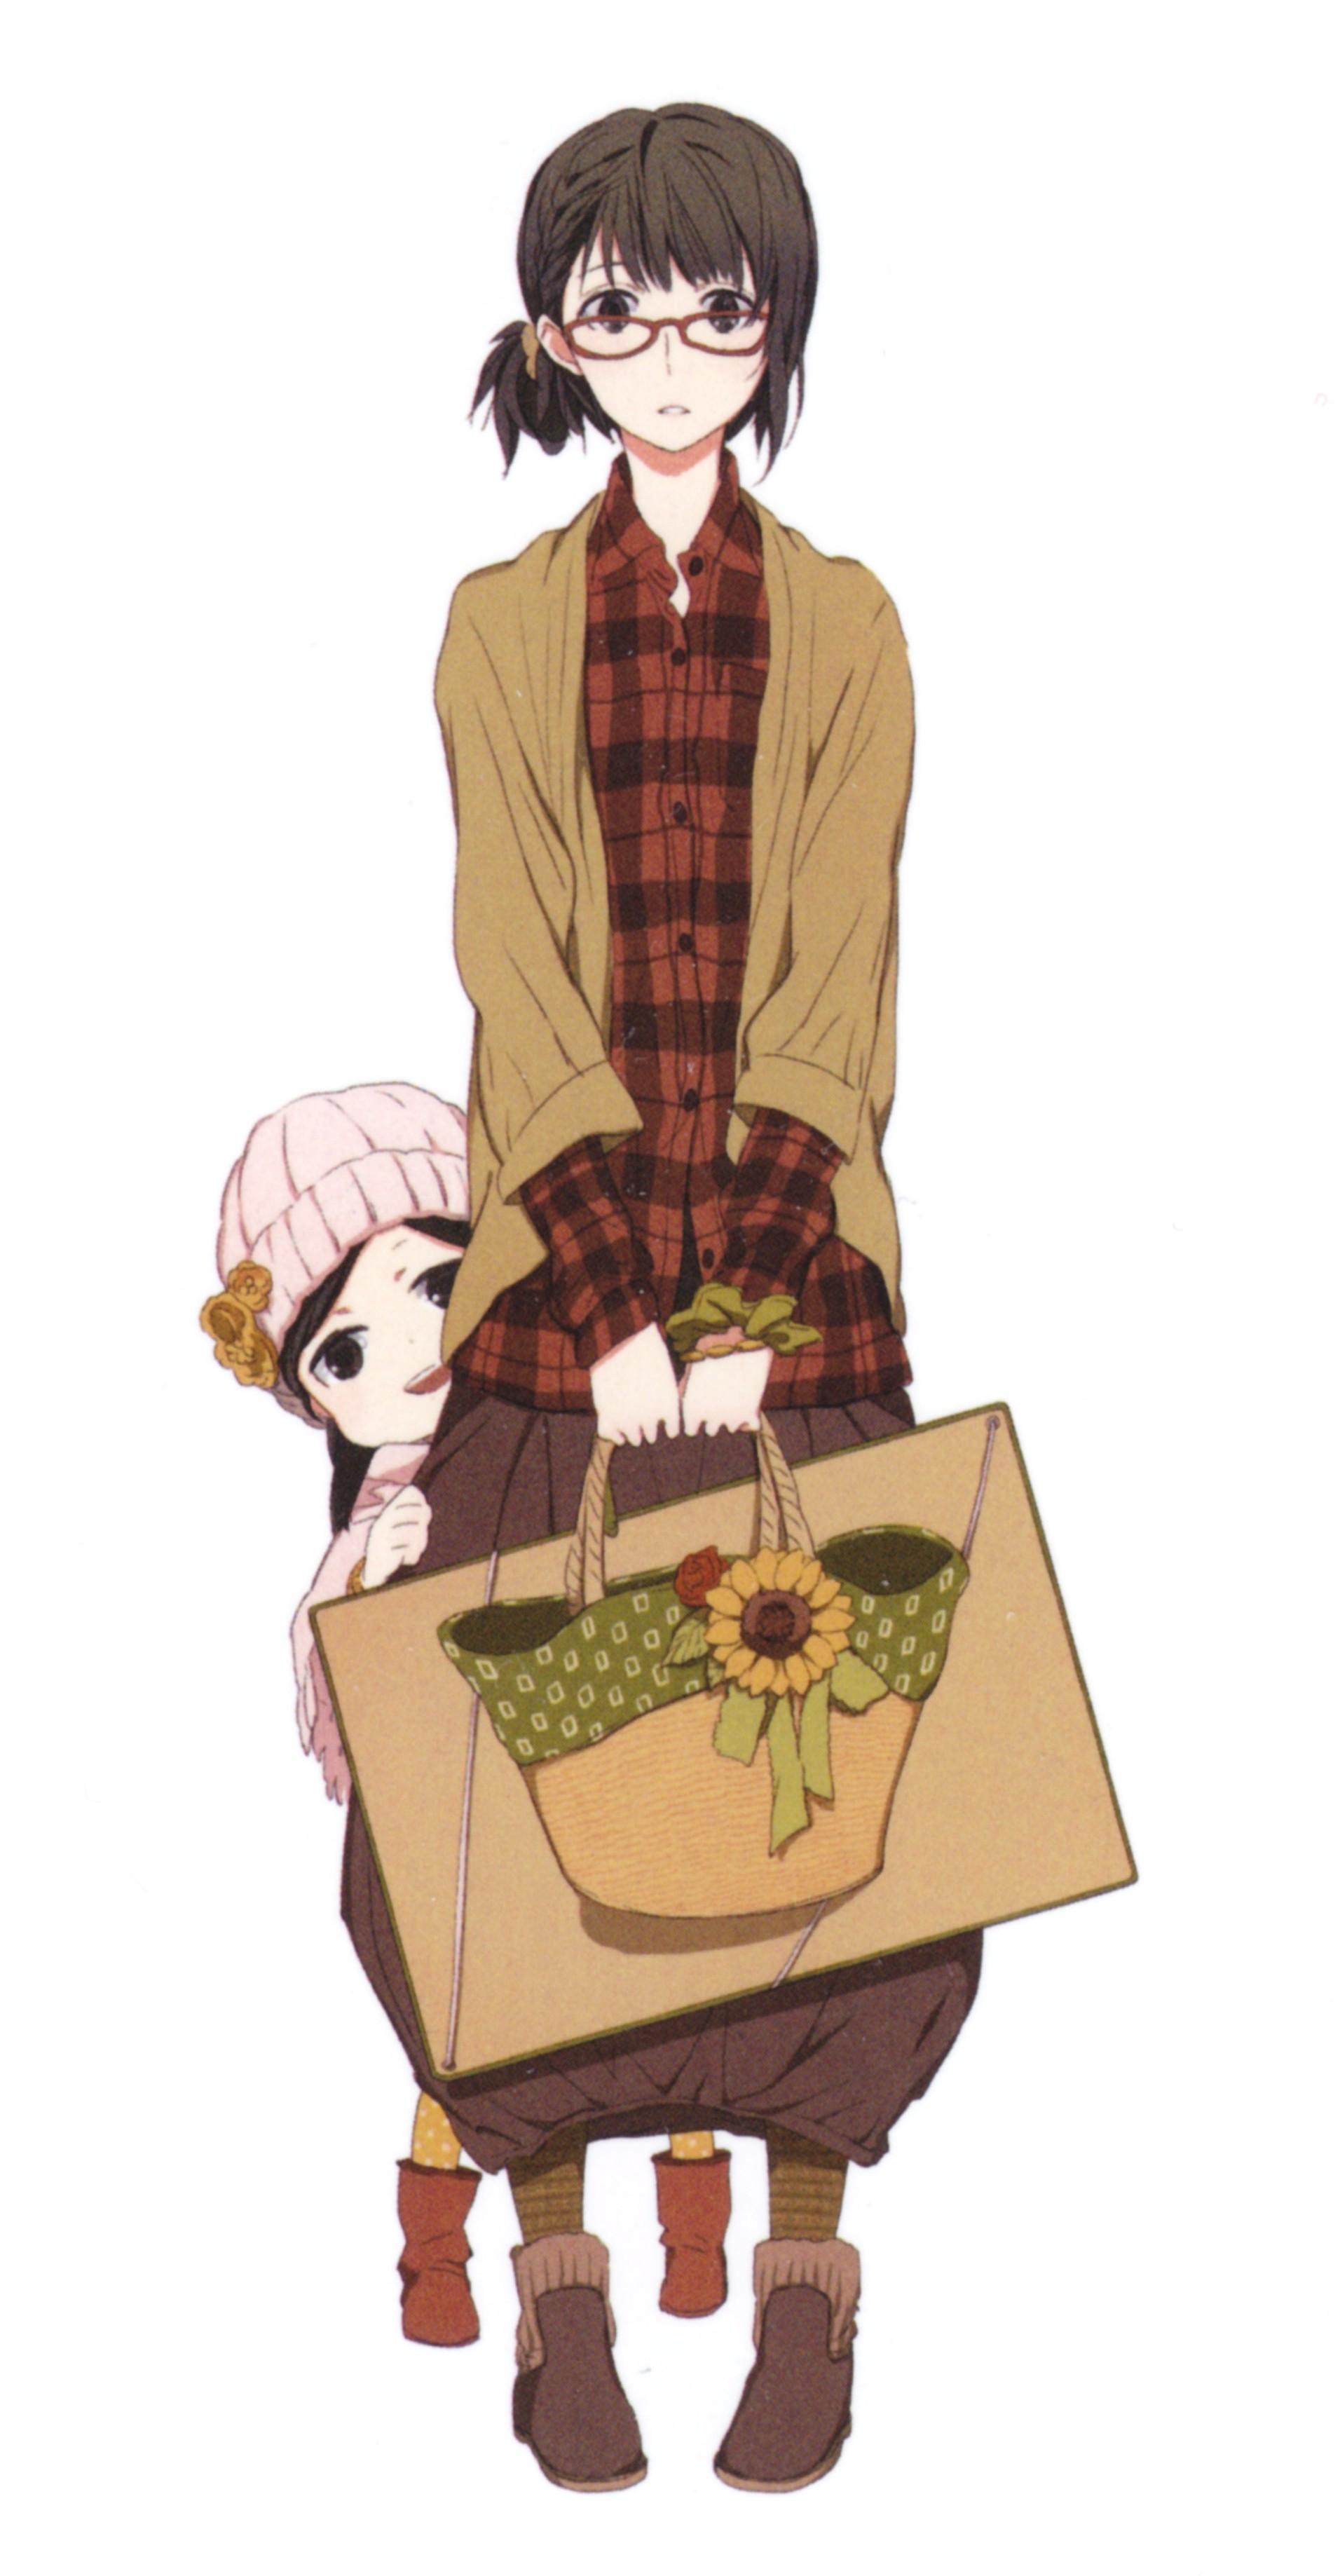 Anime 1912x3675 Barakamon anime girls Kubota Hina Arai Tamako